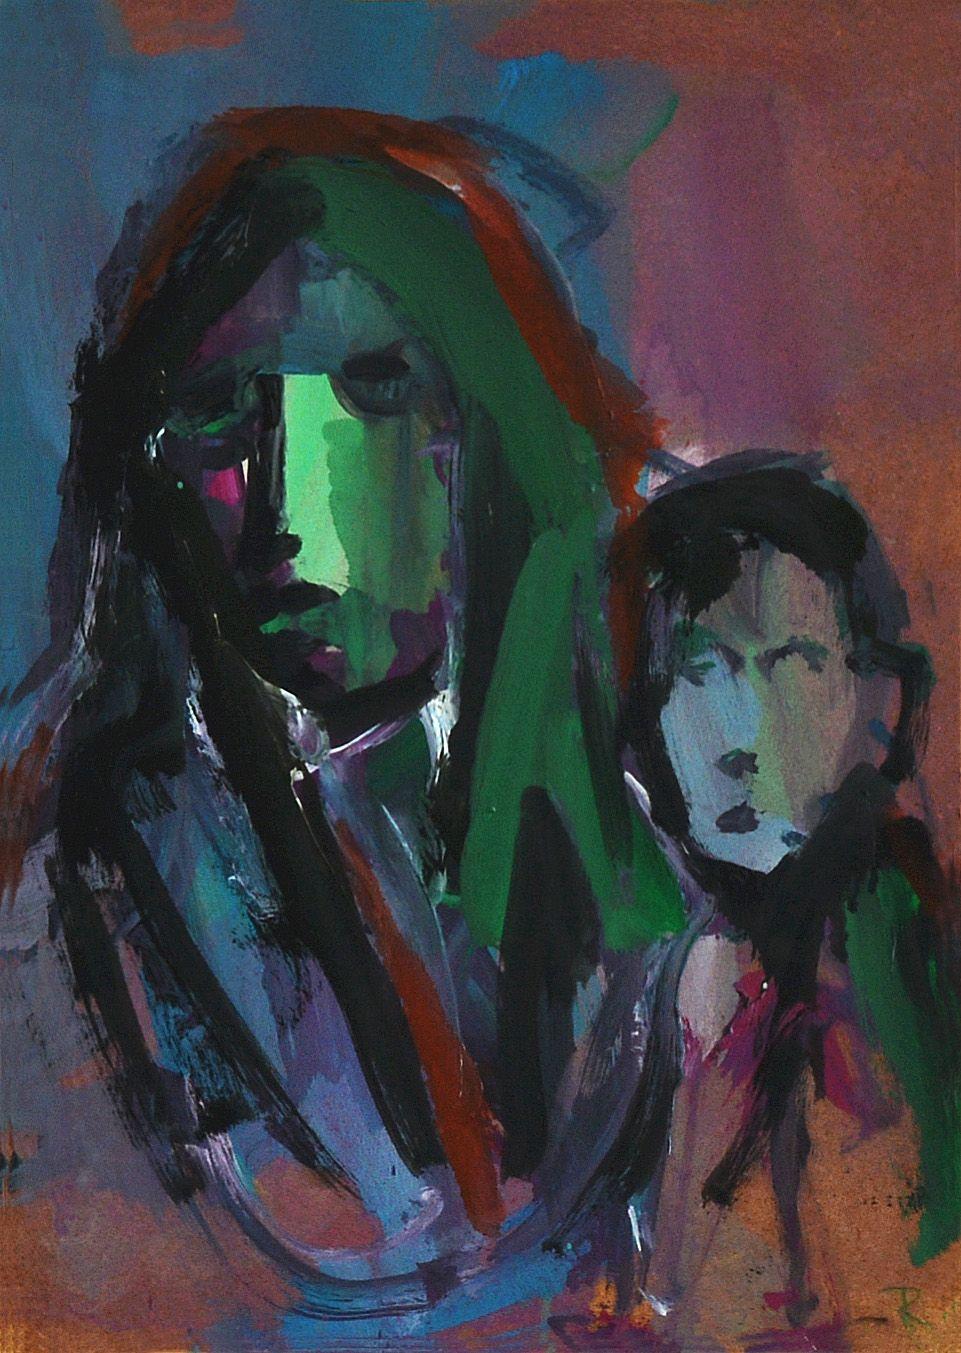 Sin título. Óleo sobre tabla. 40 x 27,5 cm. 2005. - Artista: Jorge Rando